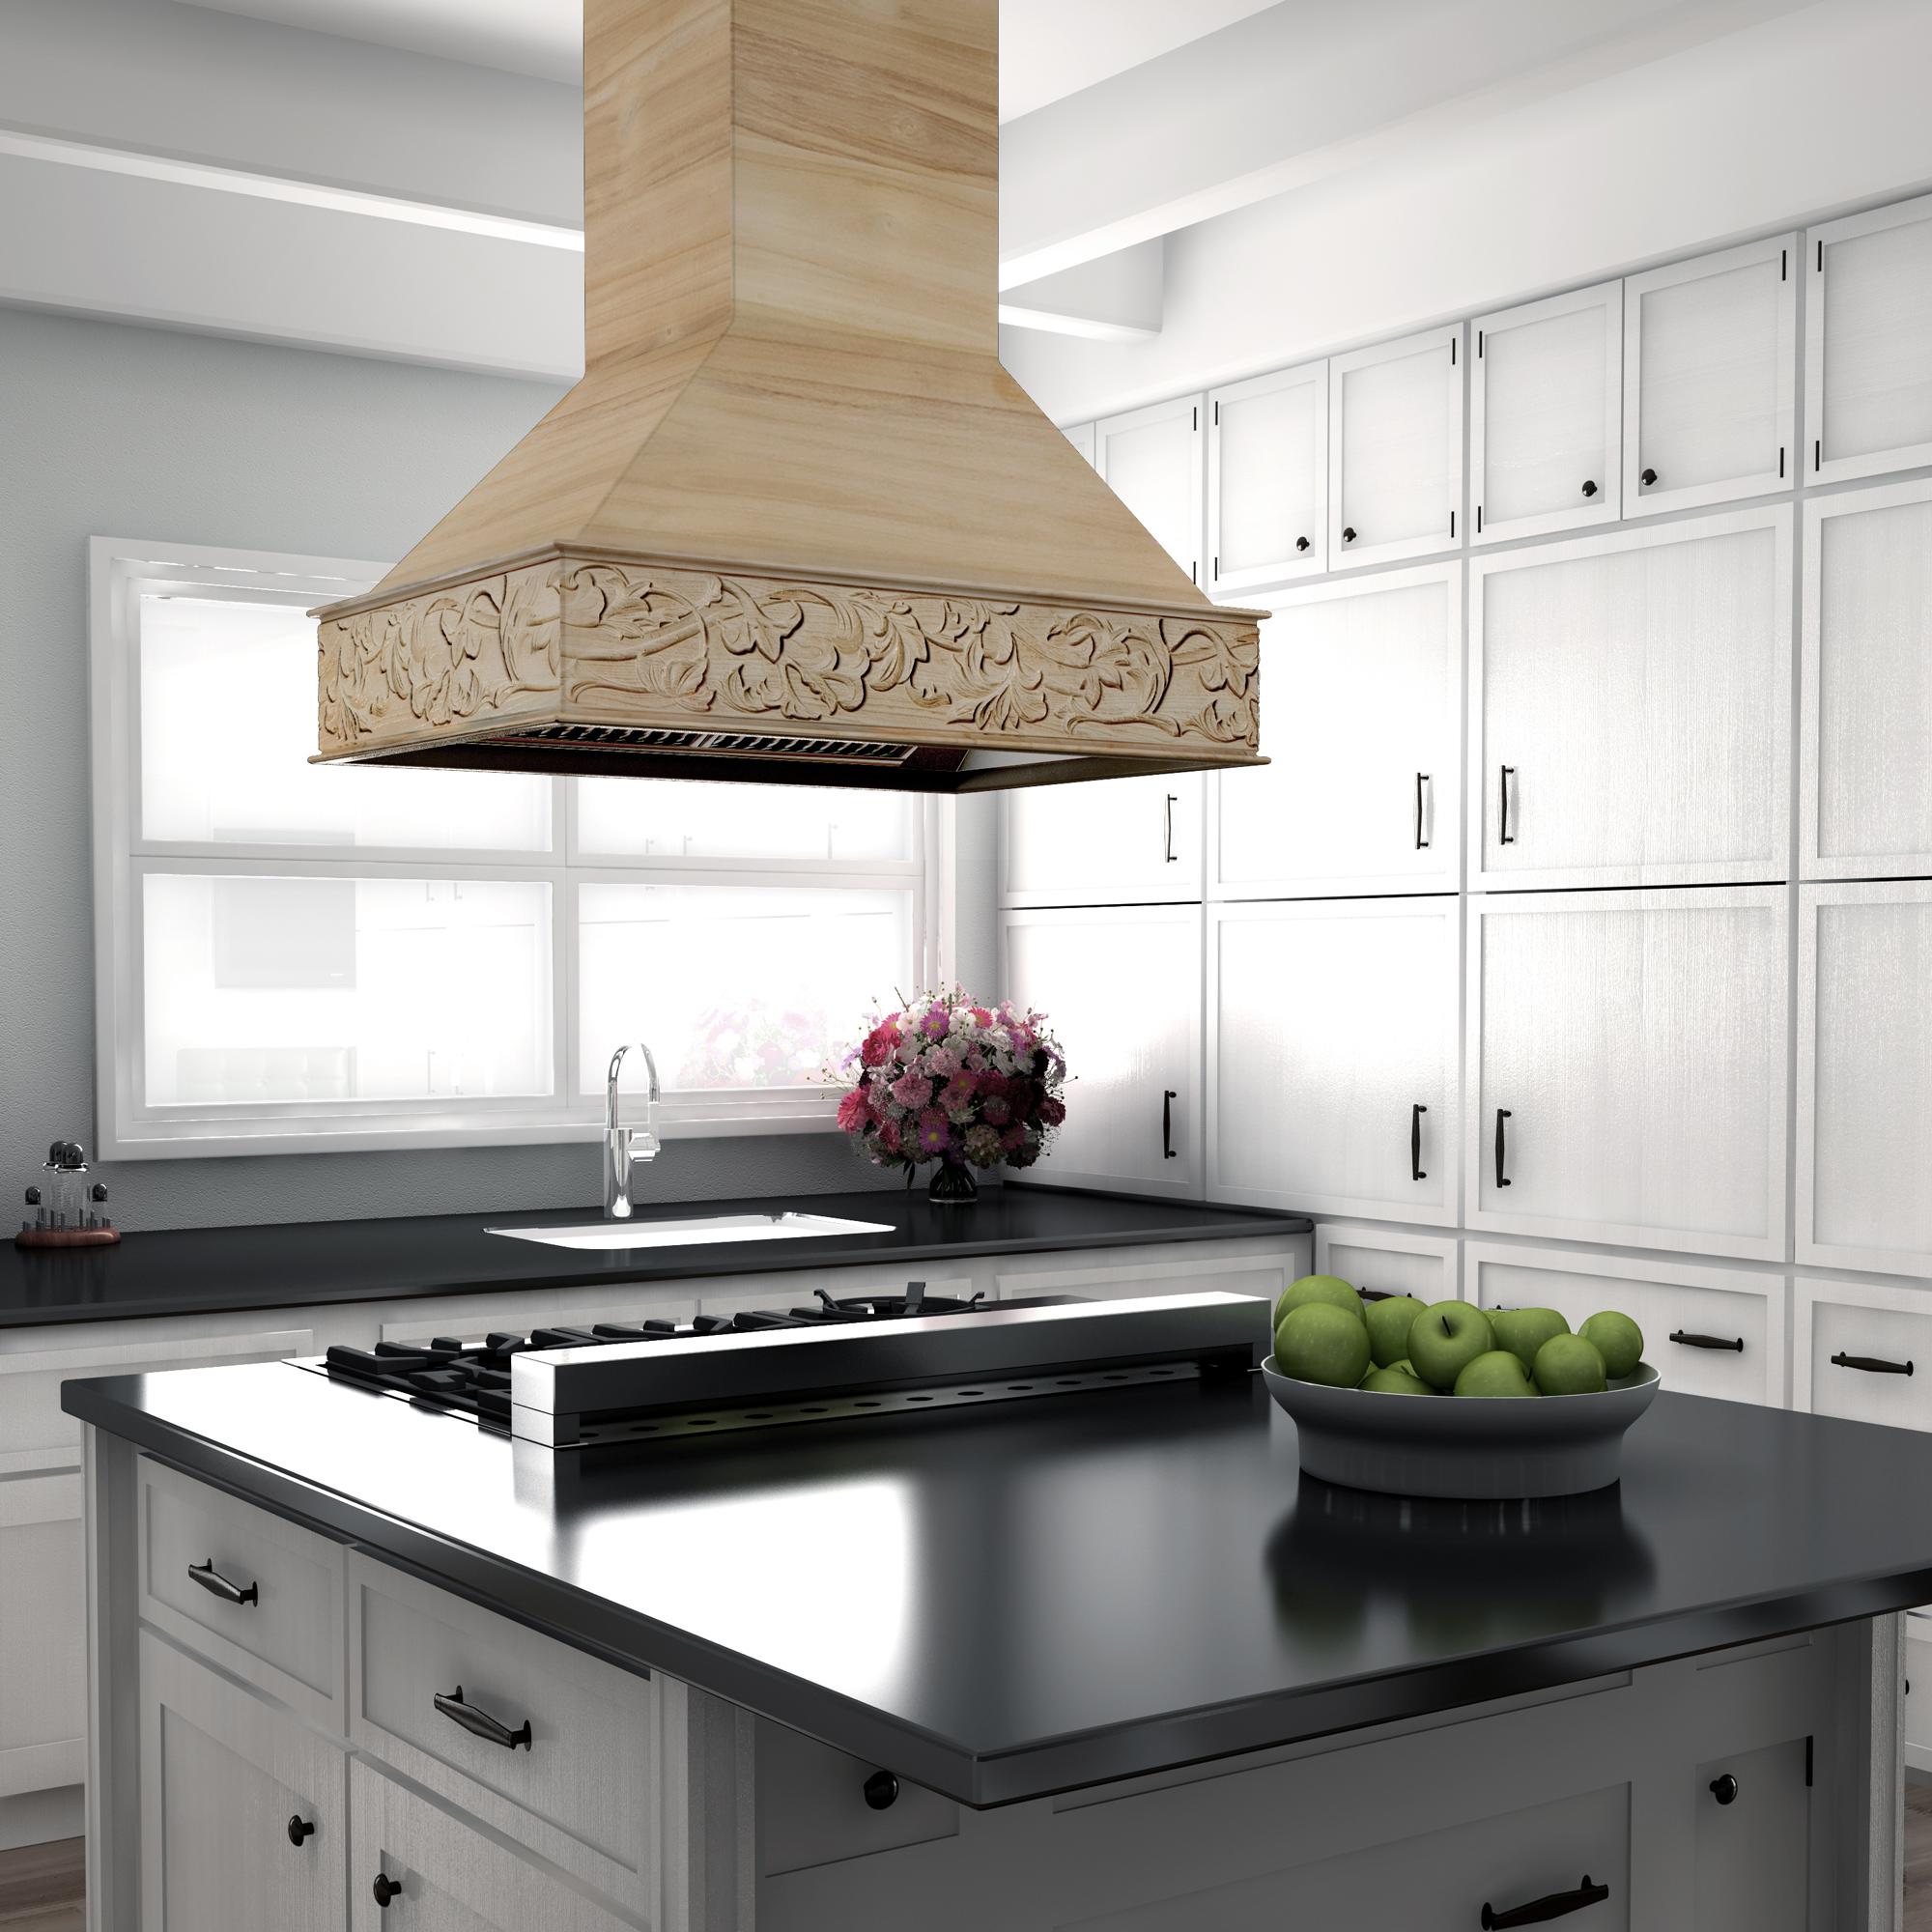 9373_UF_New_kitchen05_Images_Dropin_Cam_02_RE_B.jpg